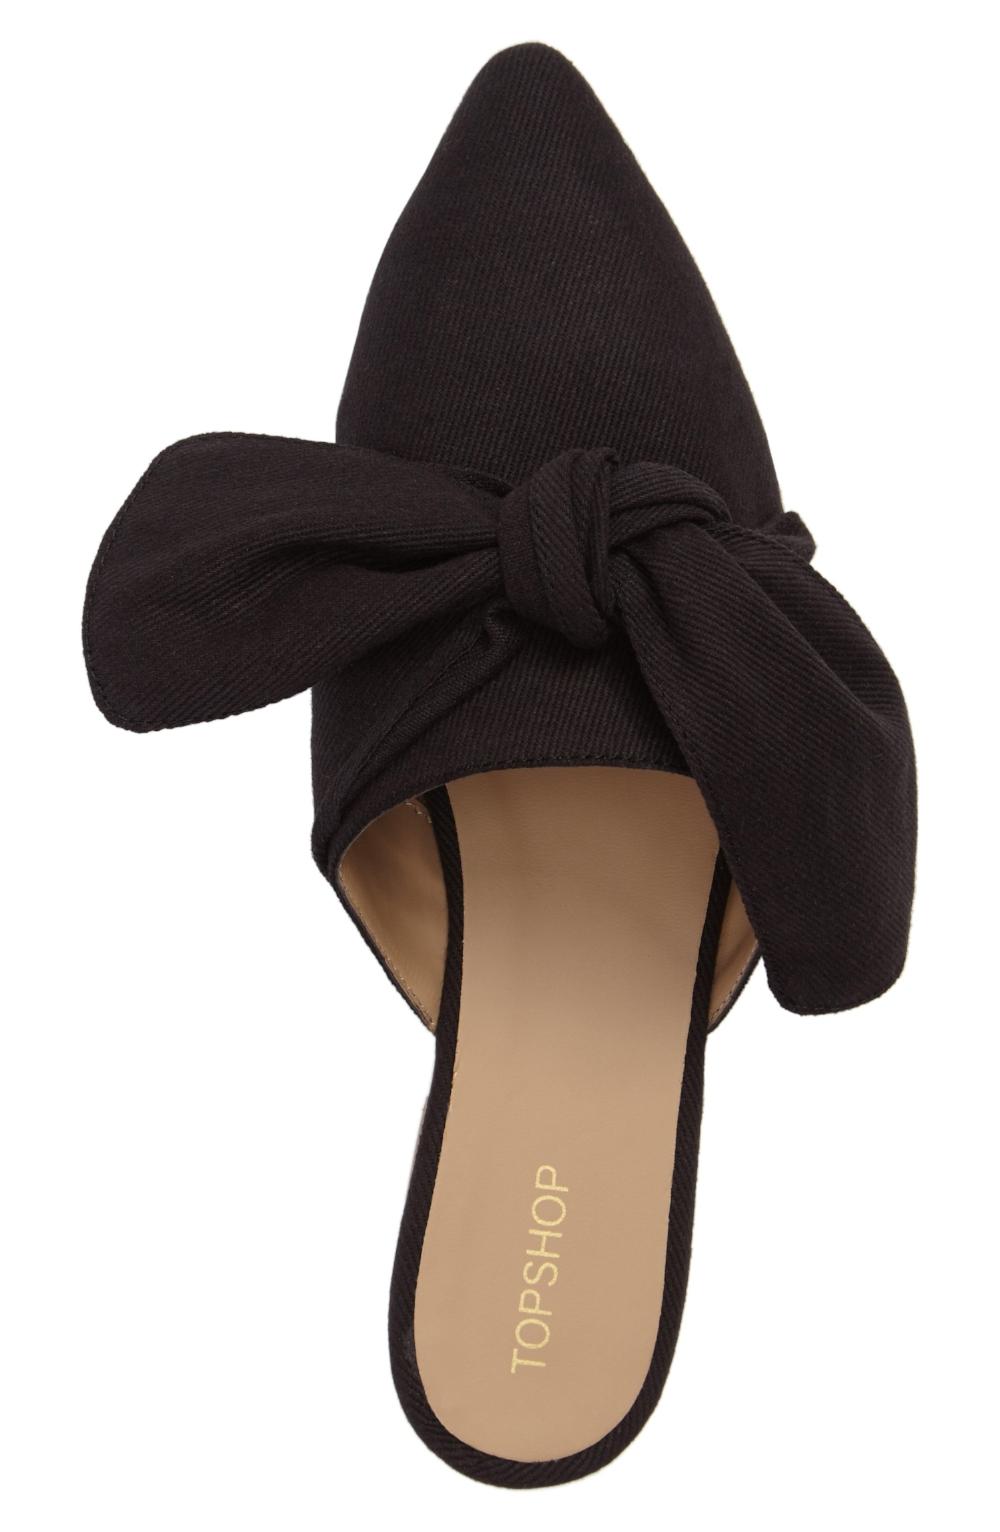 Topshop Adele Bow Flat $45